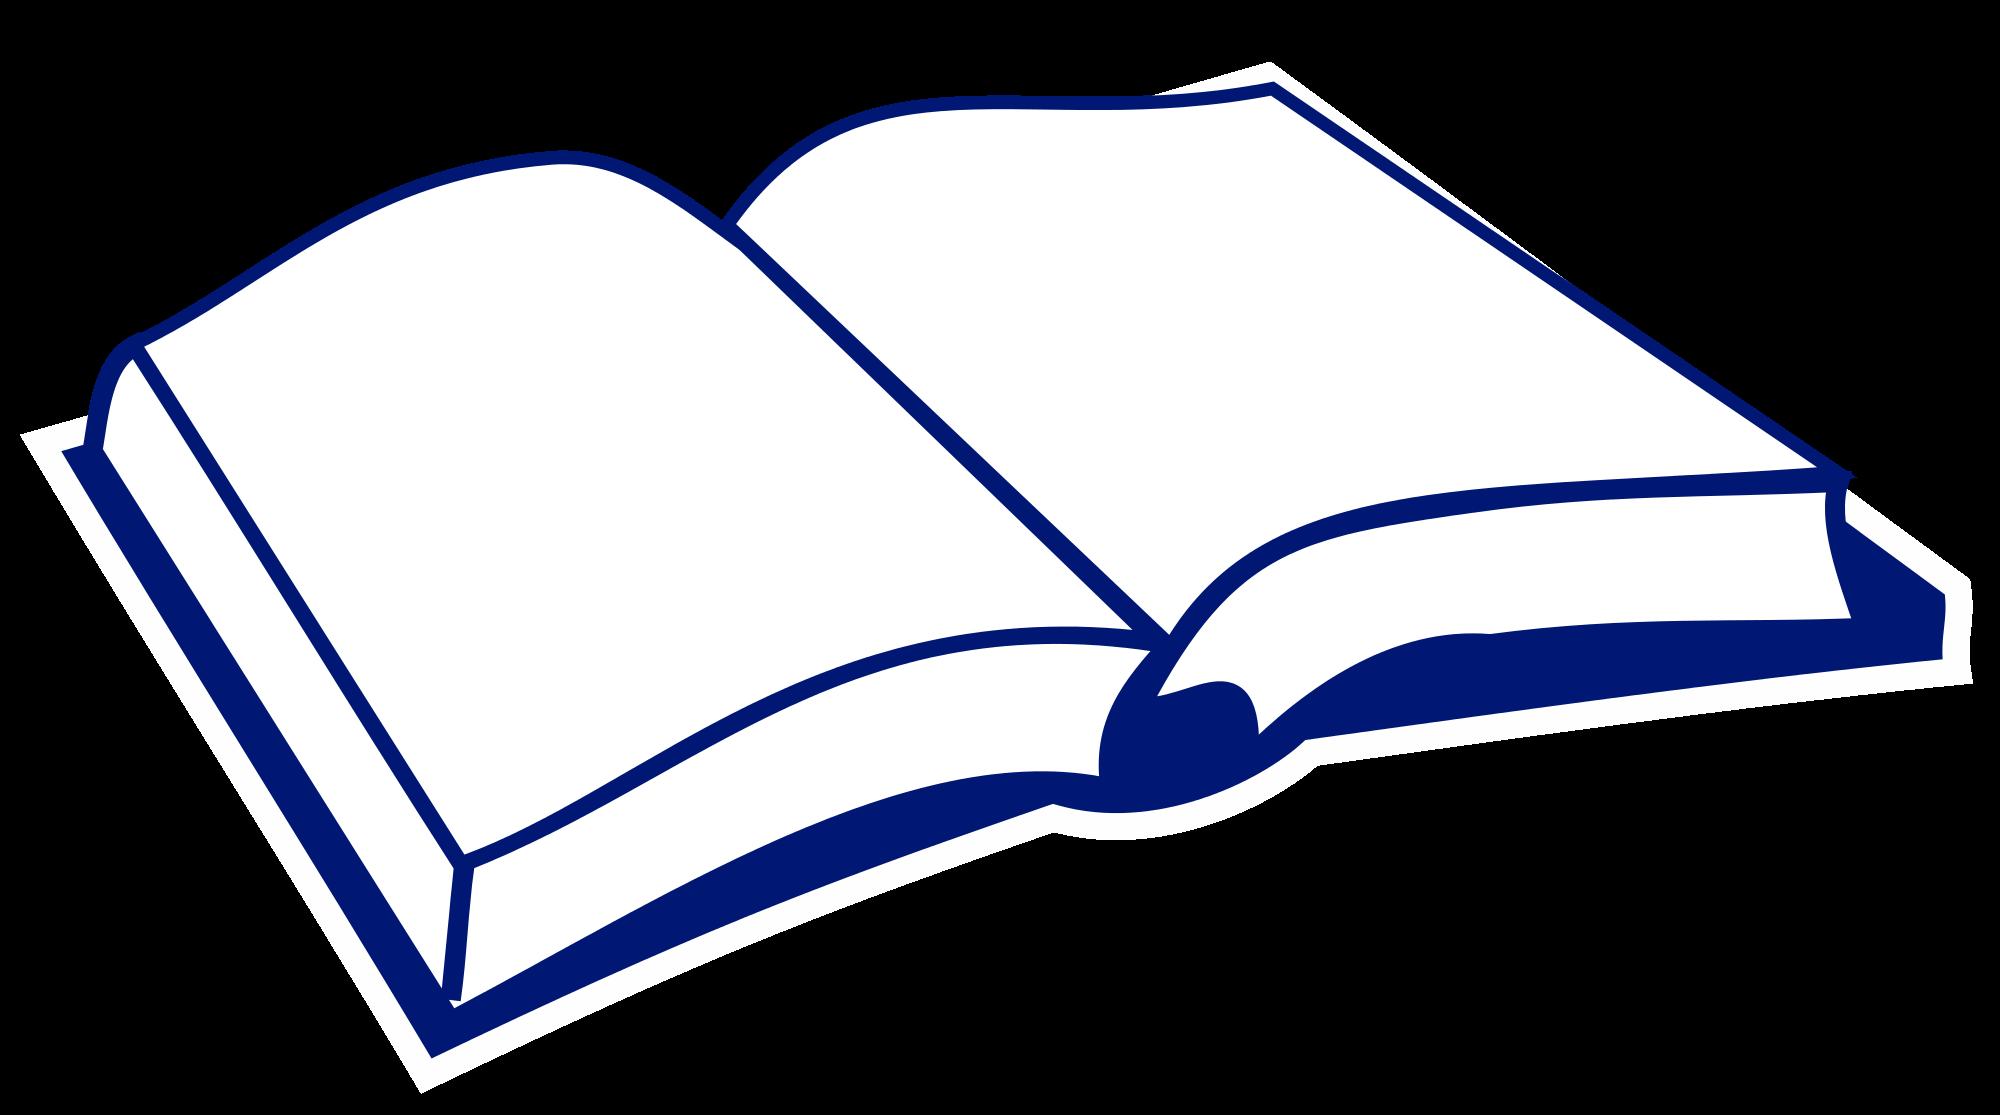 Book svg #12, Download drawings